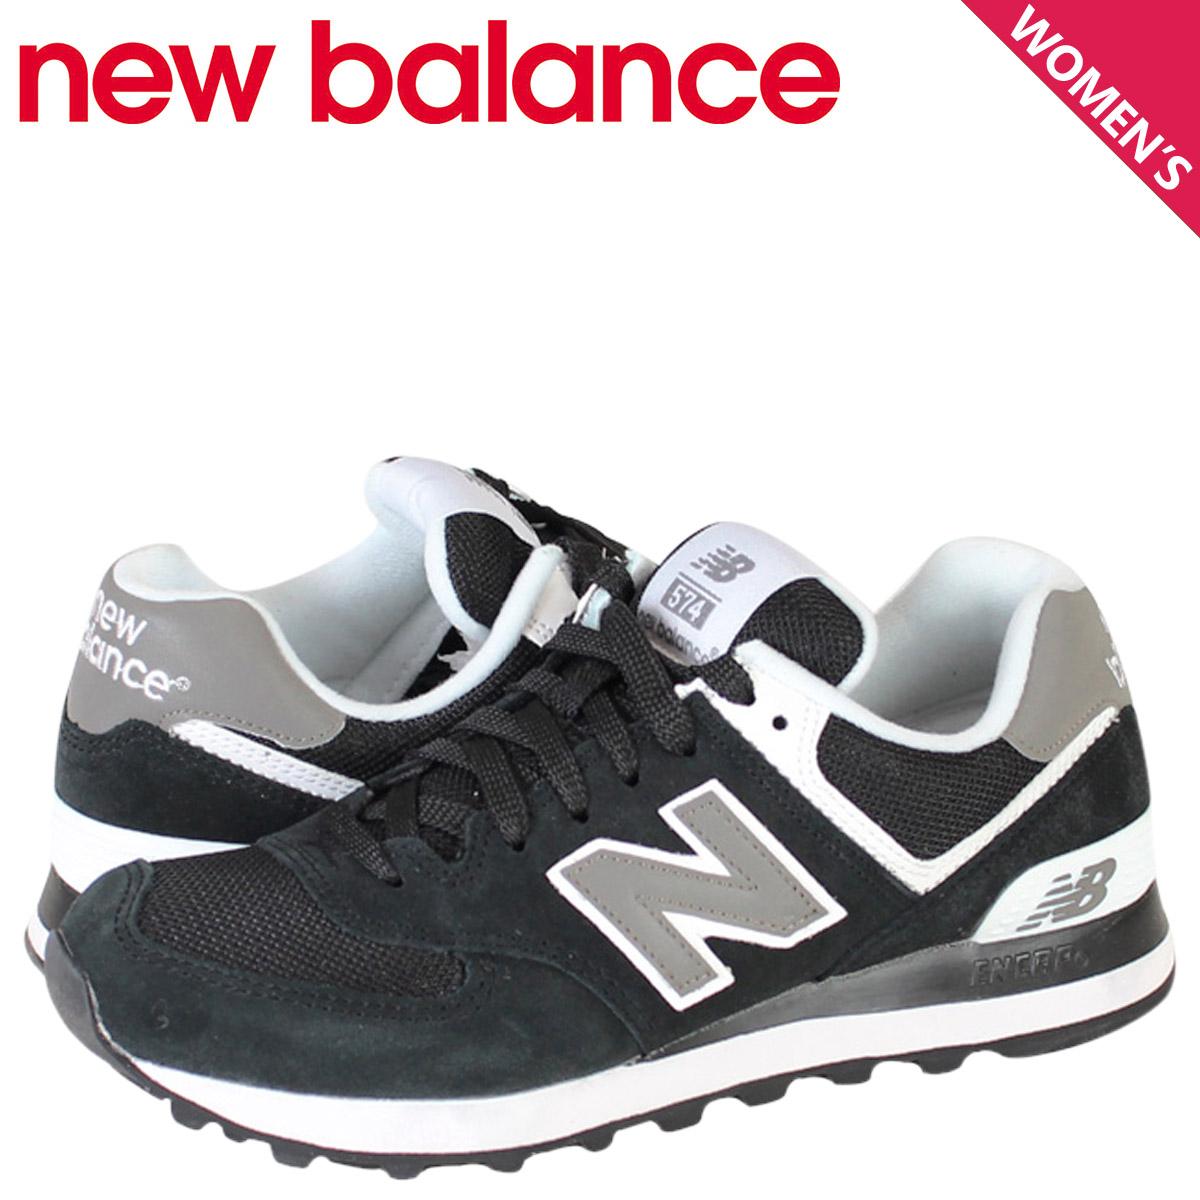 574 new balance leather